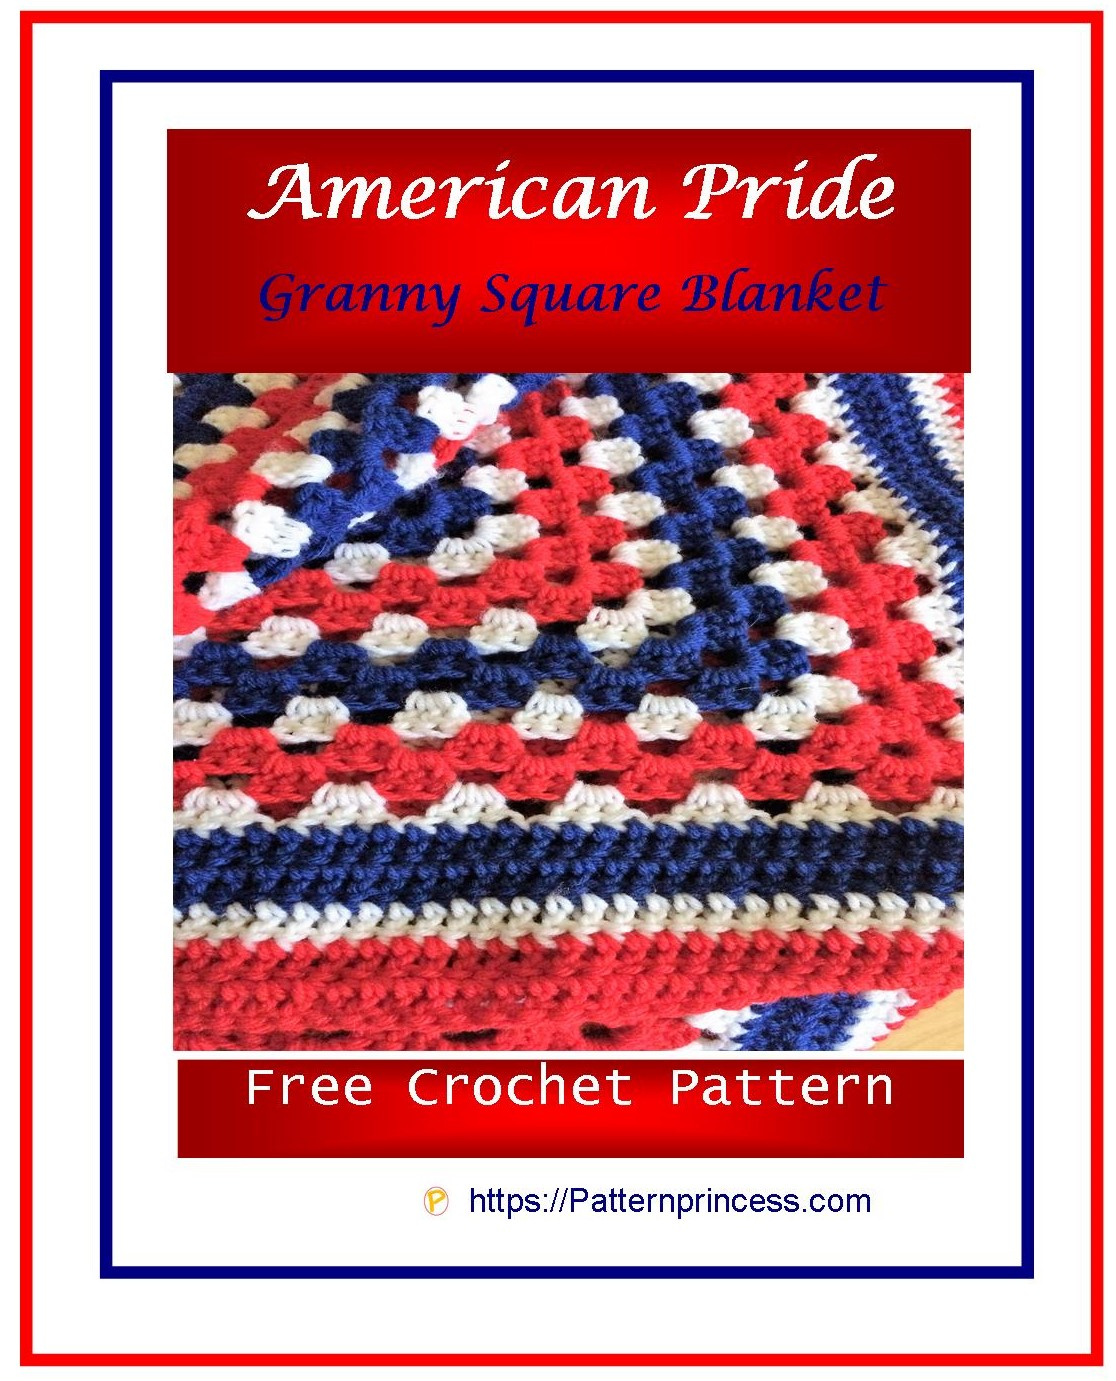 American Pride Granny Square Blanket 1